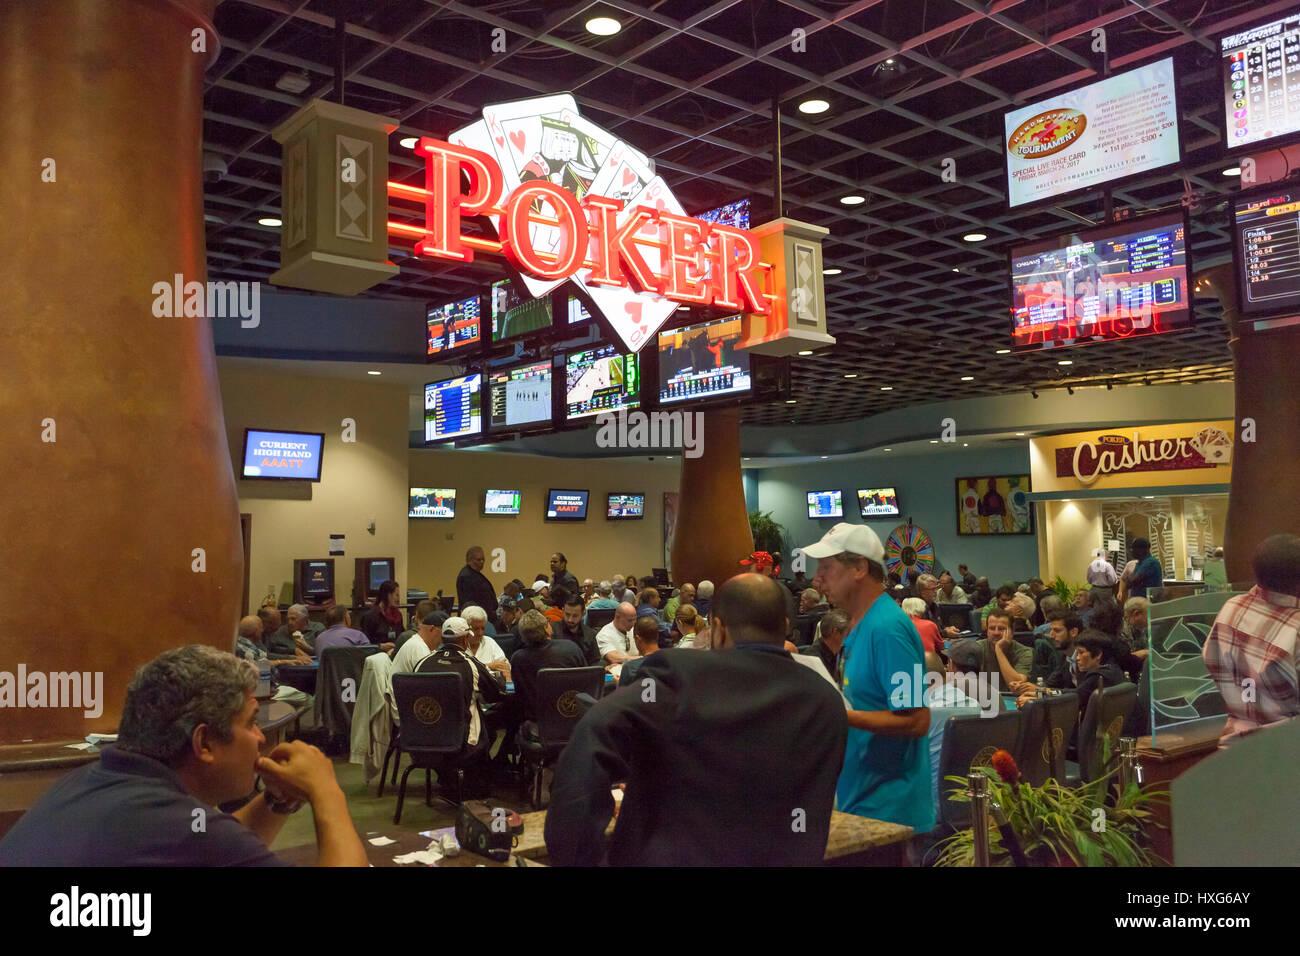 HALLANDALE BEACH, USA - MAR 11, 2017: People  gambling in the Gulfstream park casino in Hallandale Beach. Florida, - Stock Image